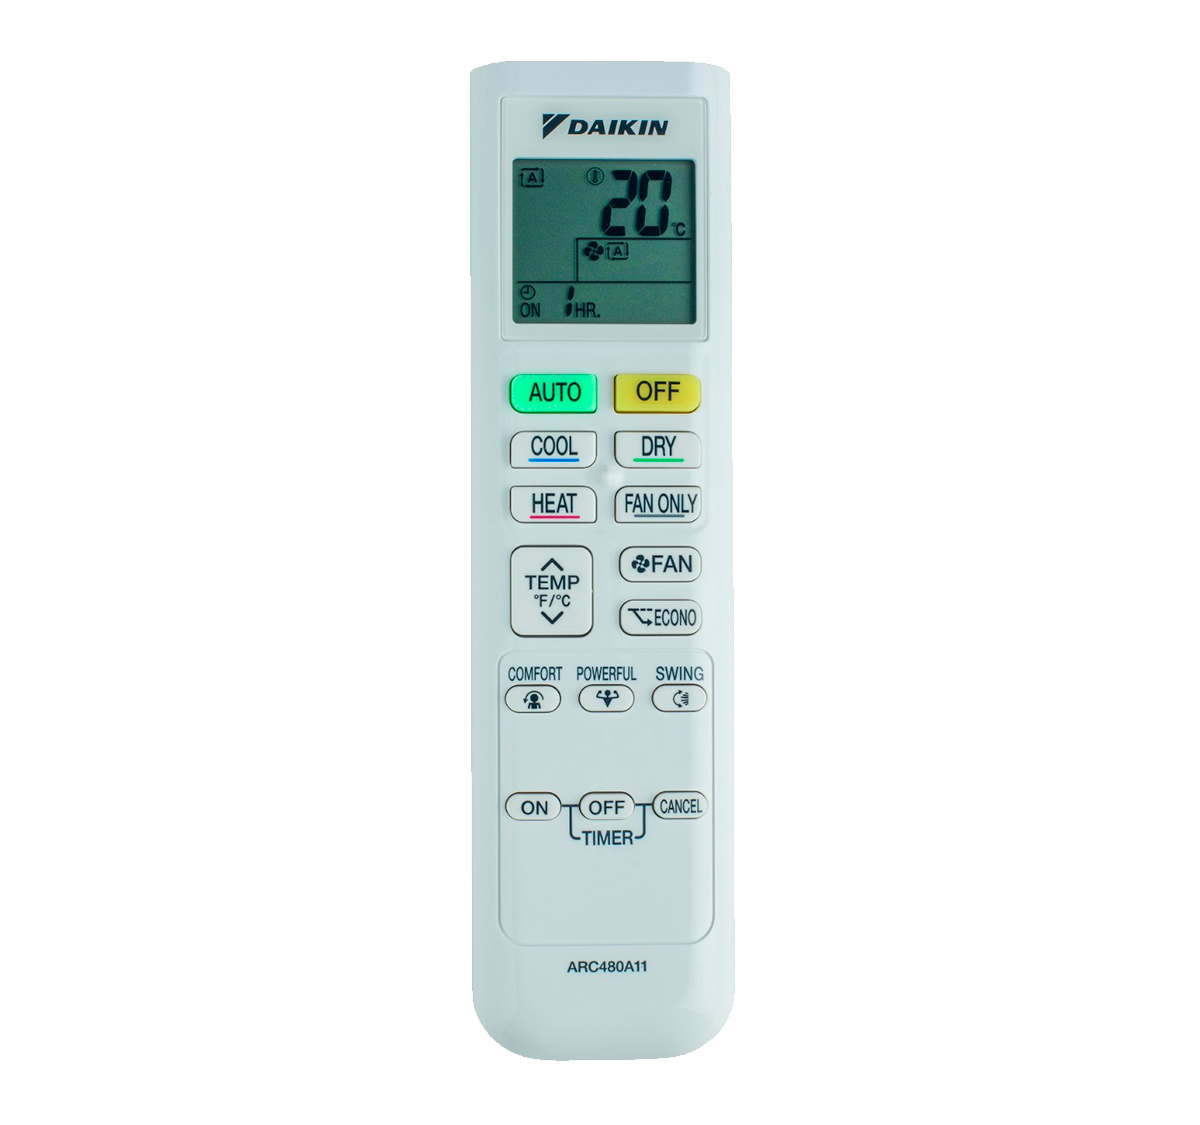 aire acondicionado conjunto split daikin inverter mando a diastanacia arc480a11 modelo comfora txp25m instalacion incluida caseragua